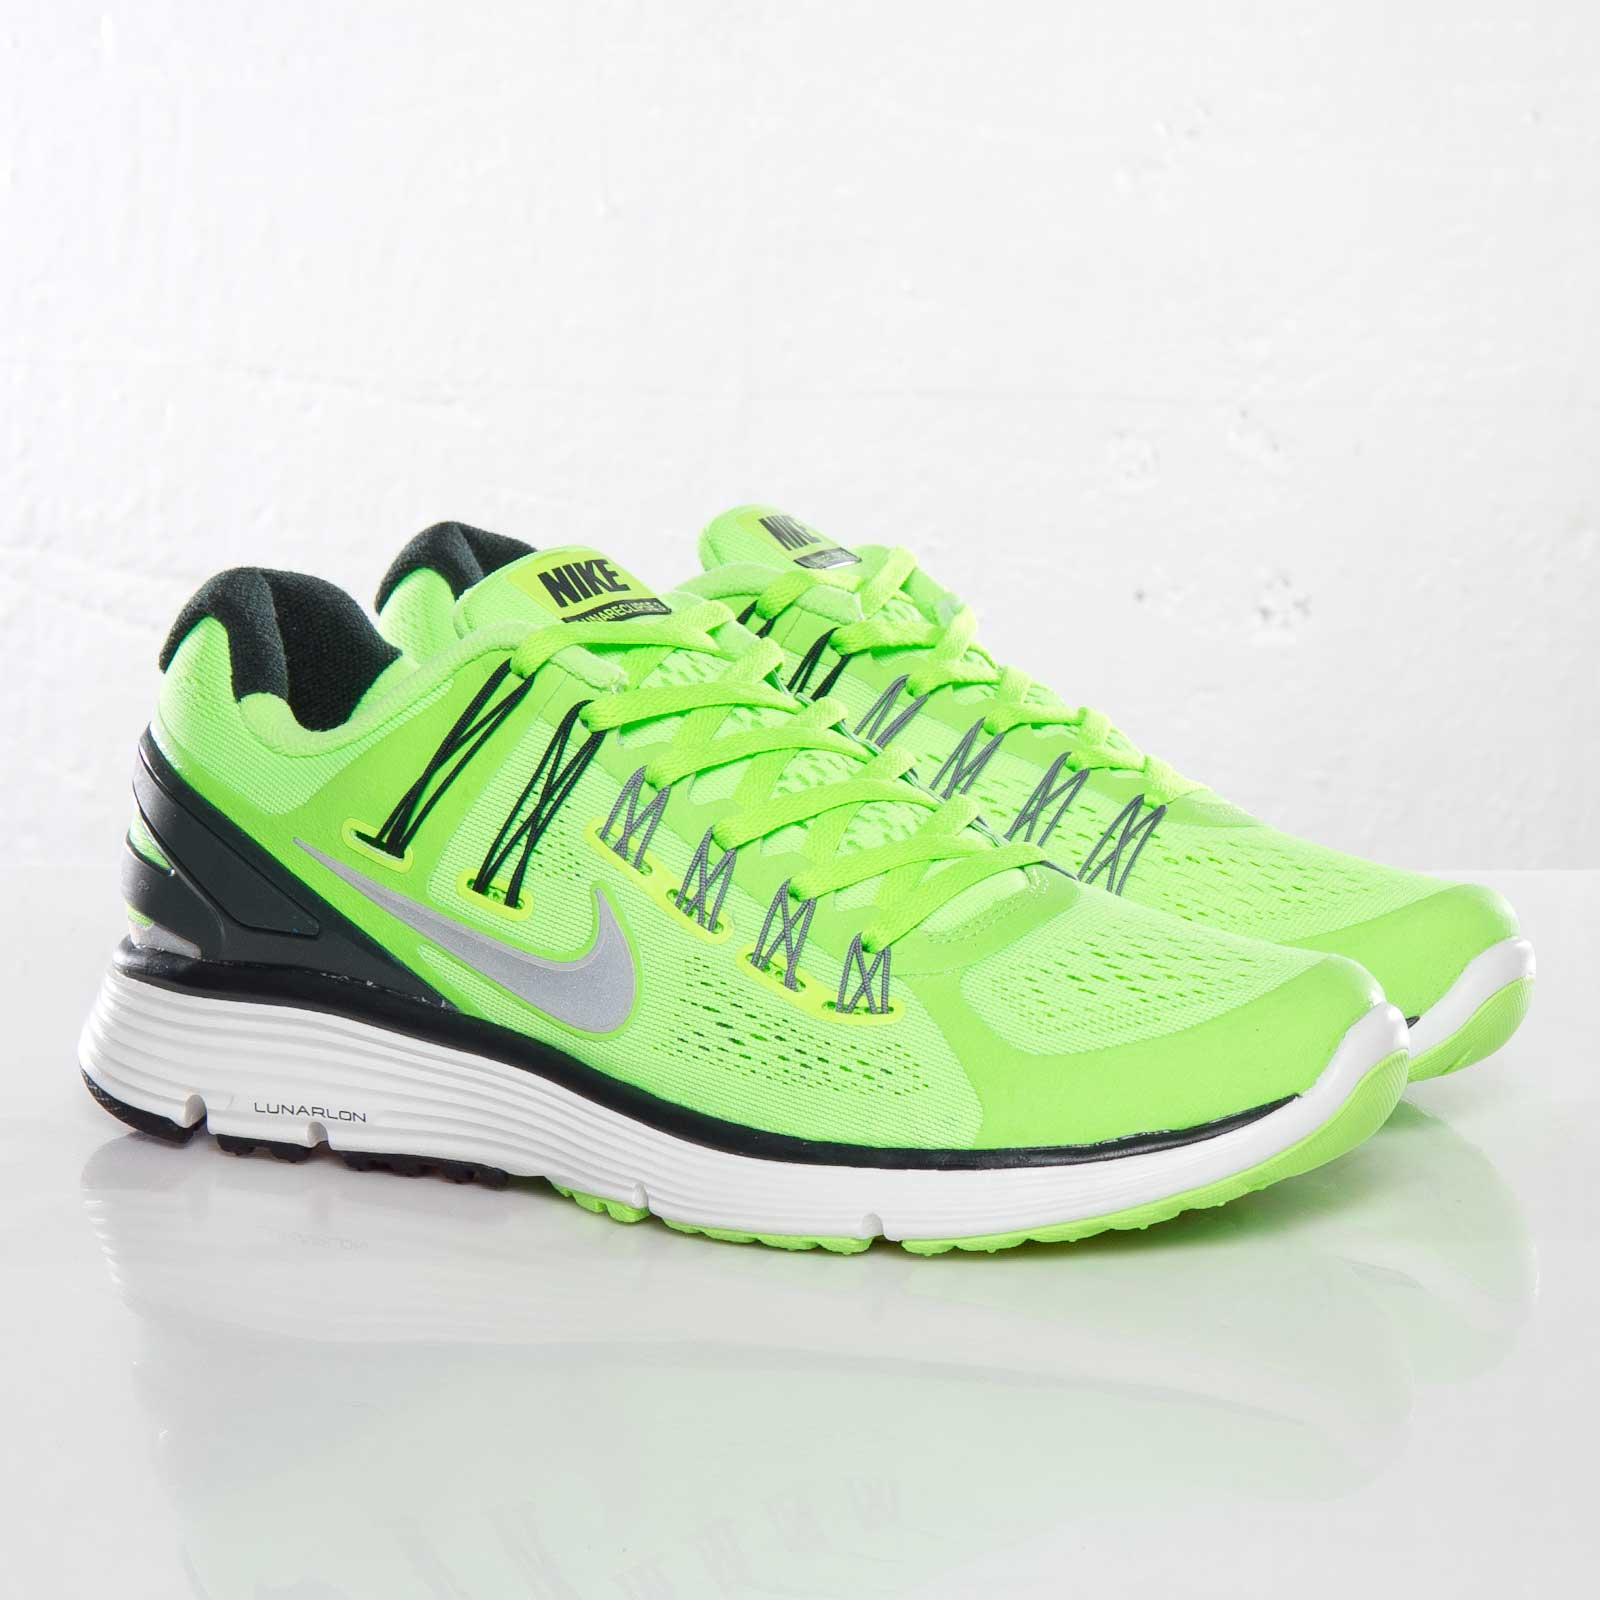 Nike Lunareclipse 3 555337 303 Sneakersnstuff Sneakers